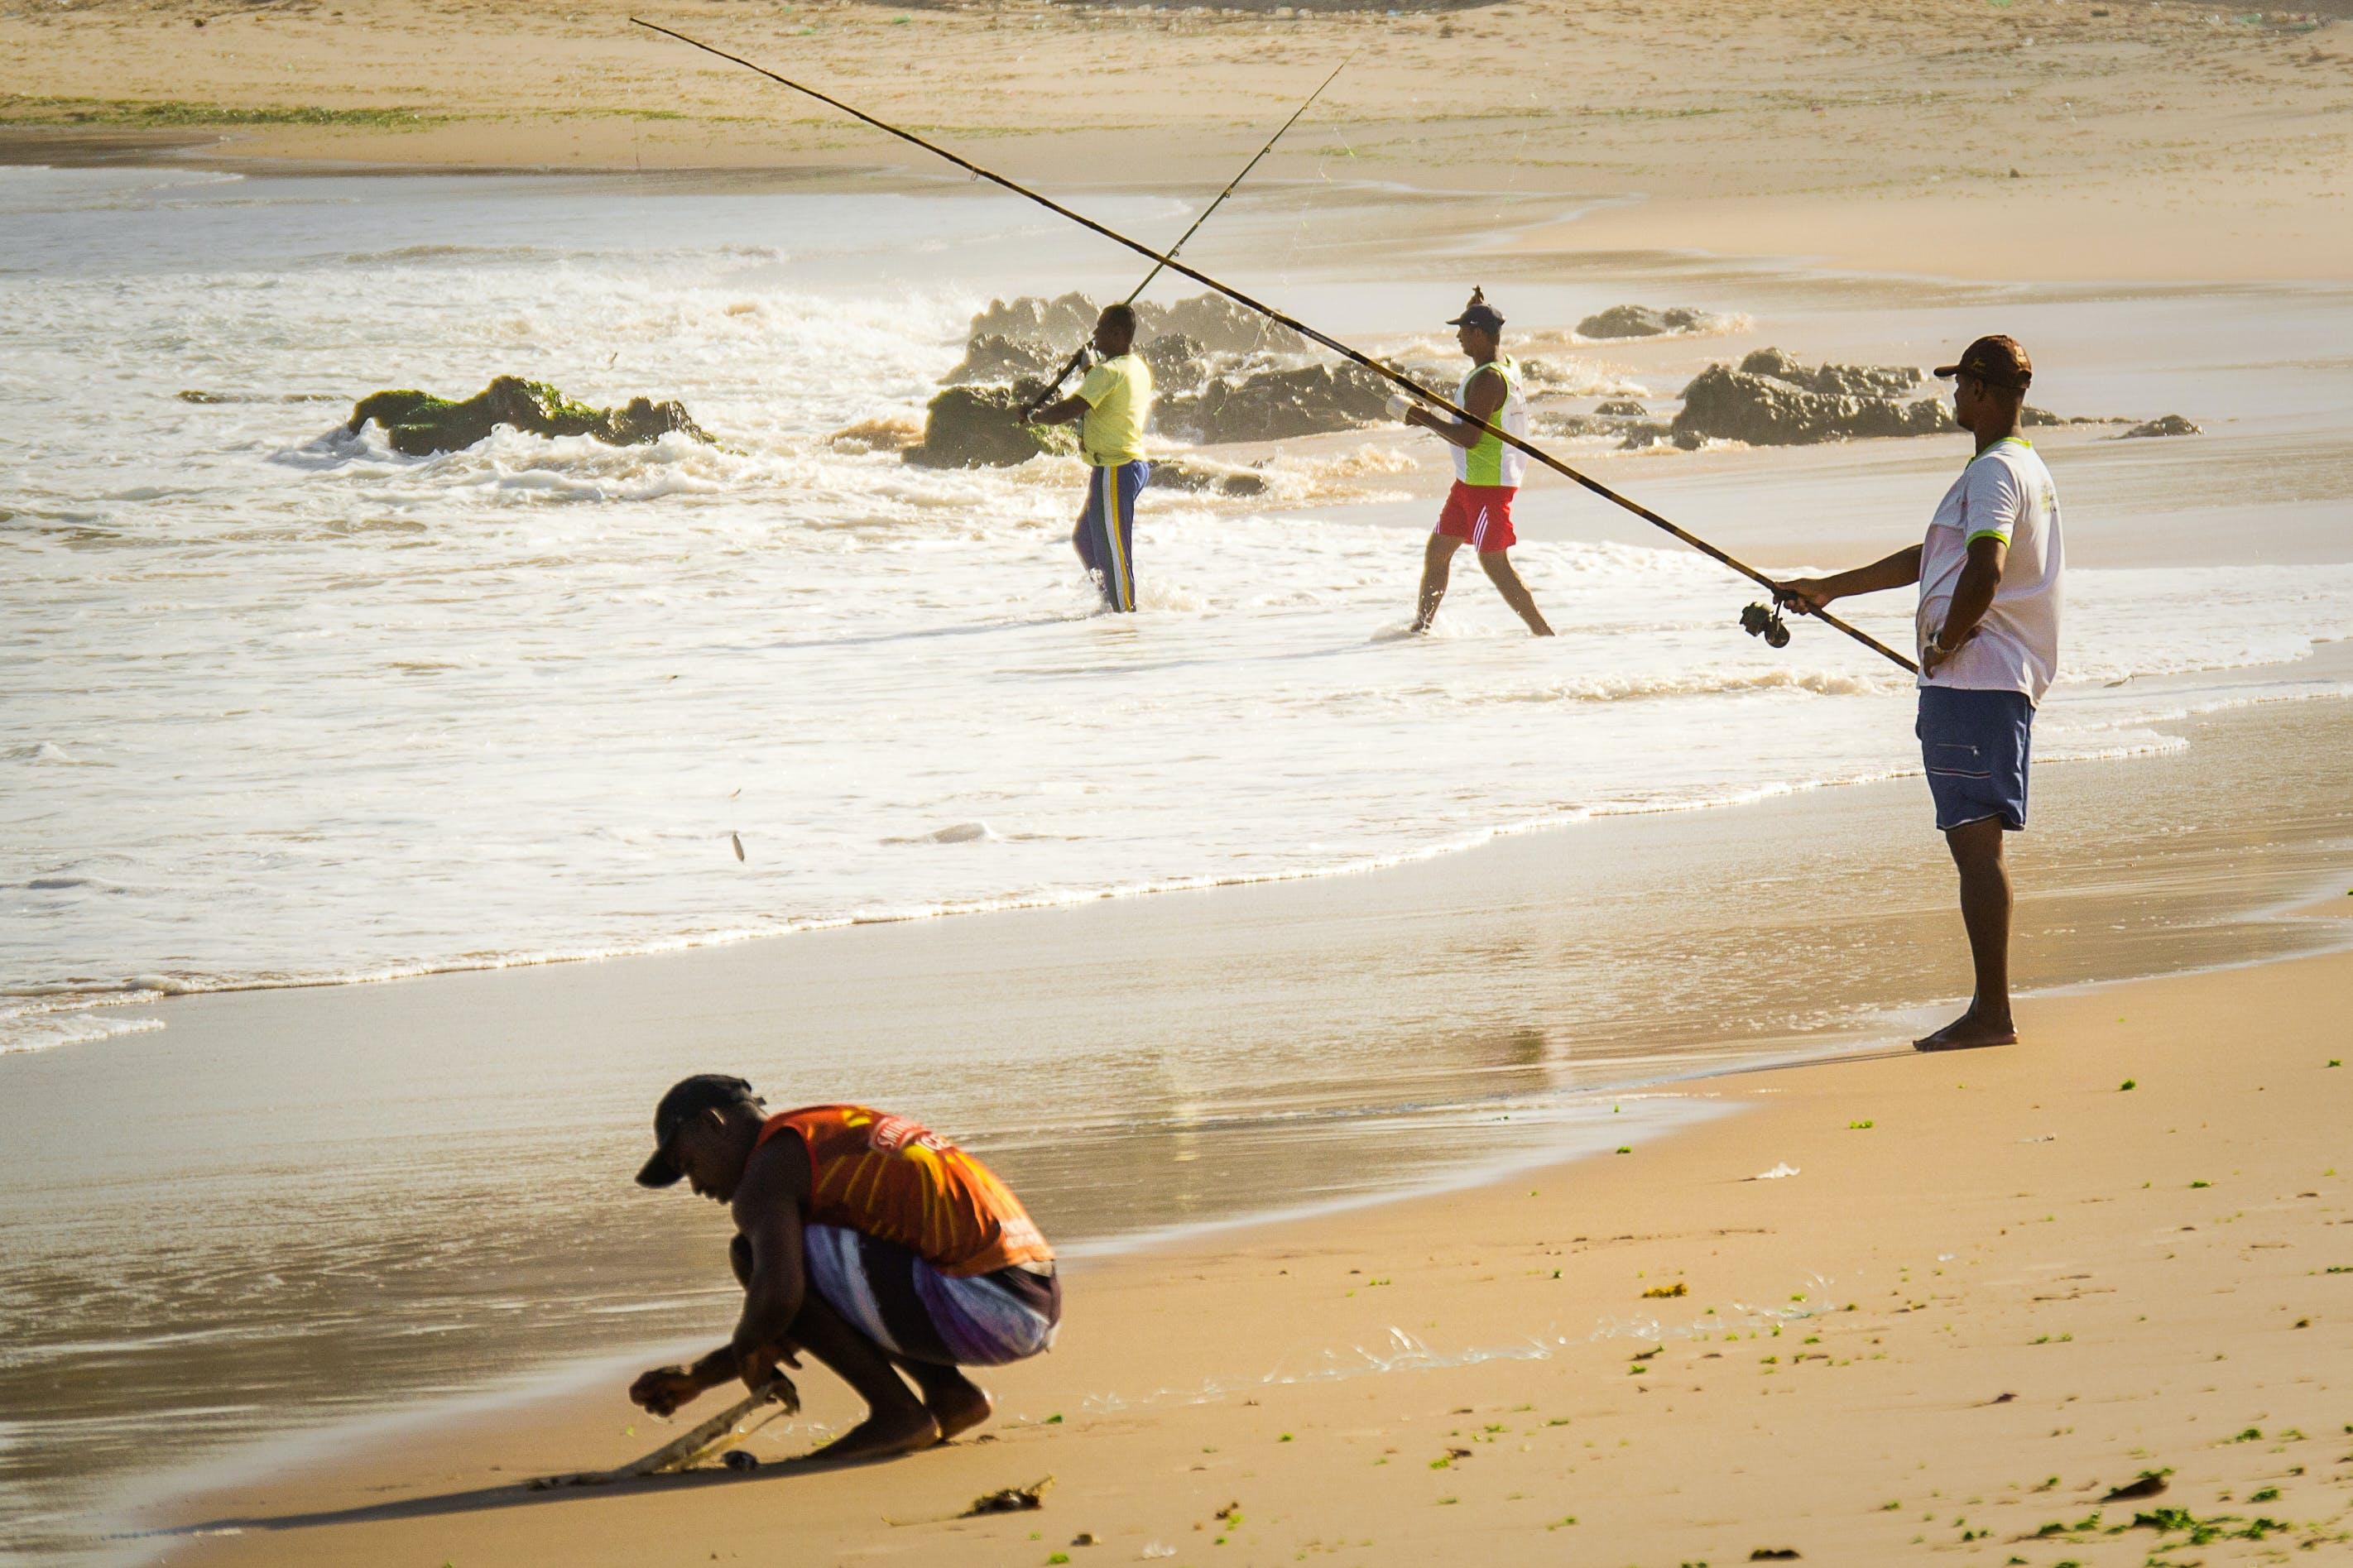 Free stock photo of fishing, fishing tackle, beach, people